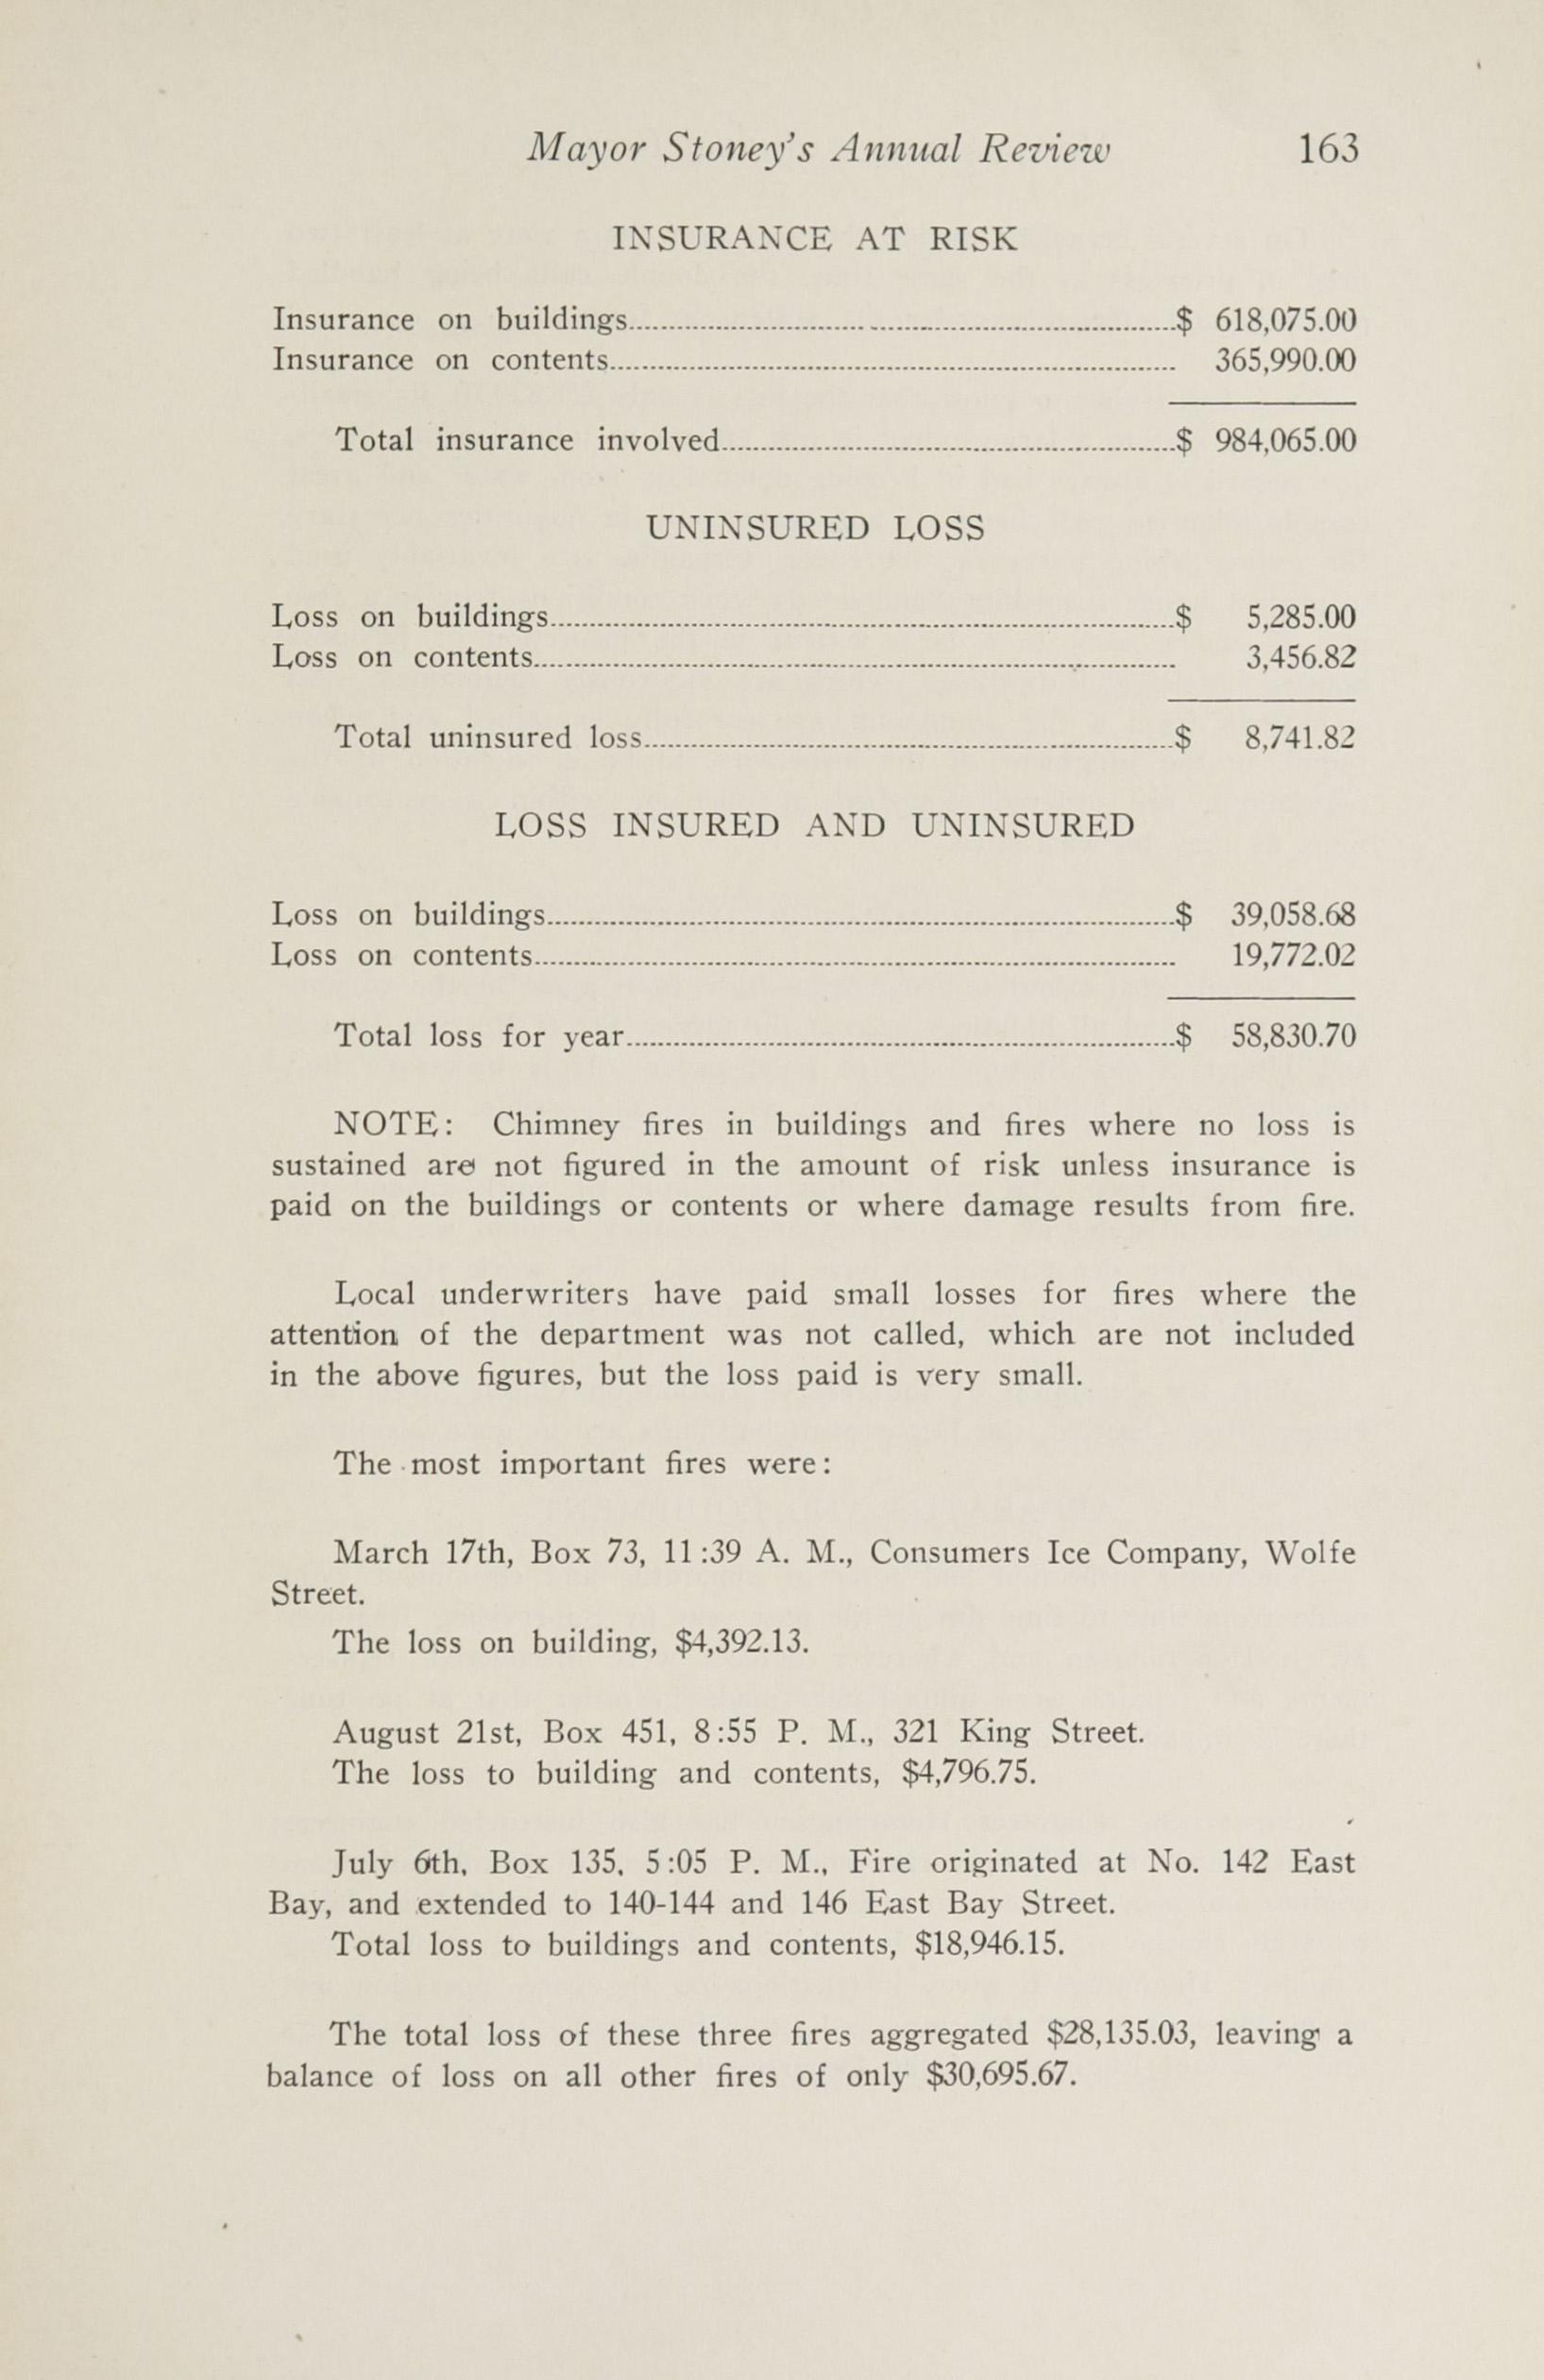 Charleston Yearbook, 1929, page 163